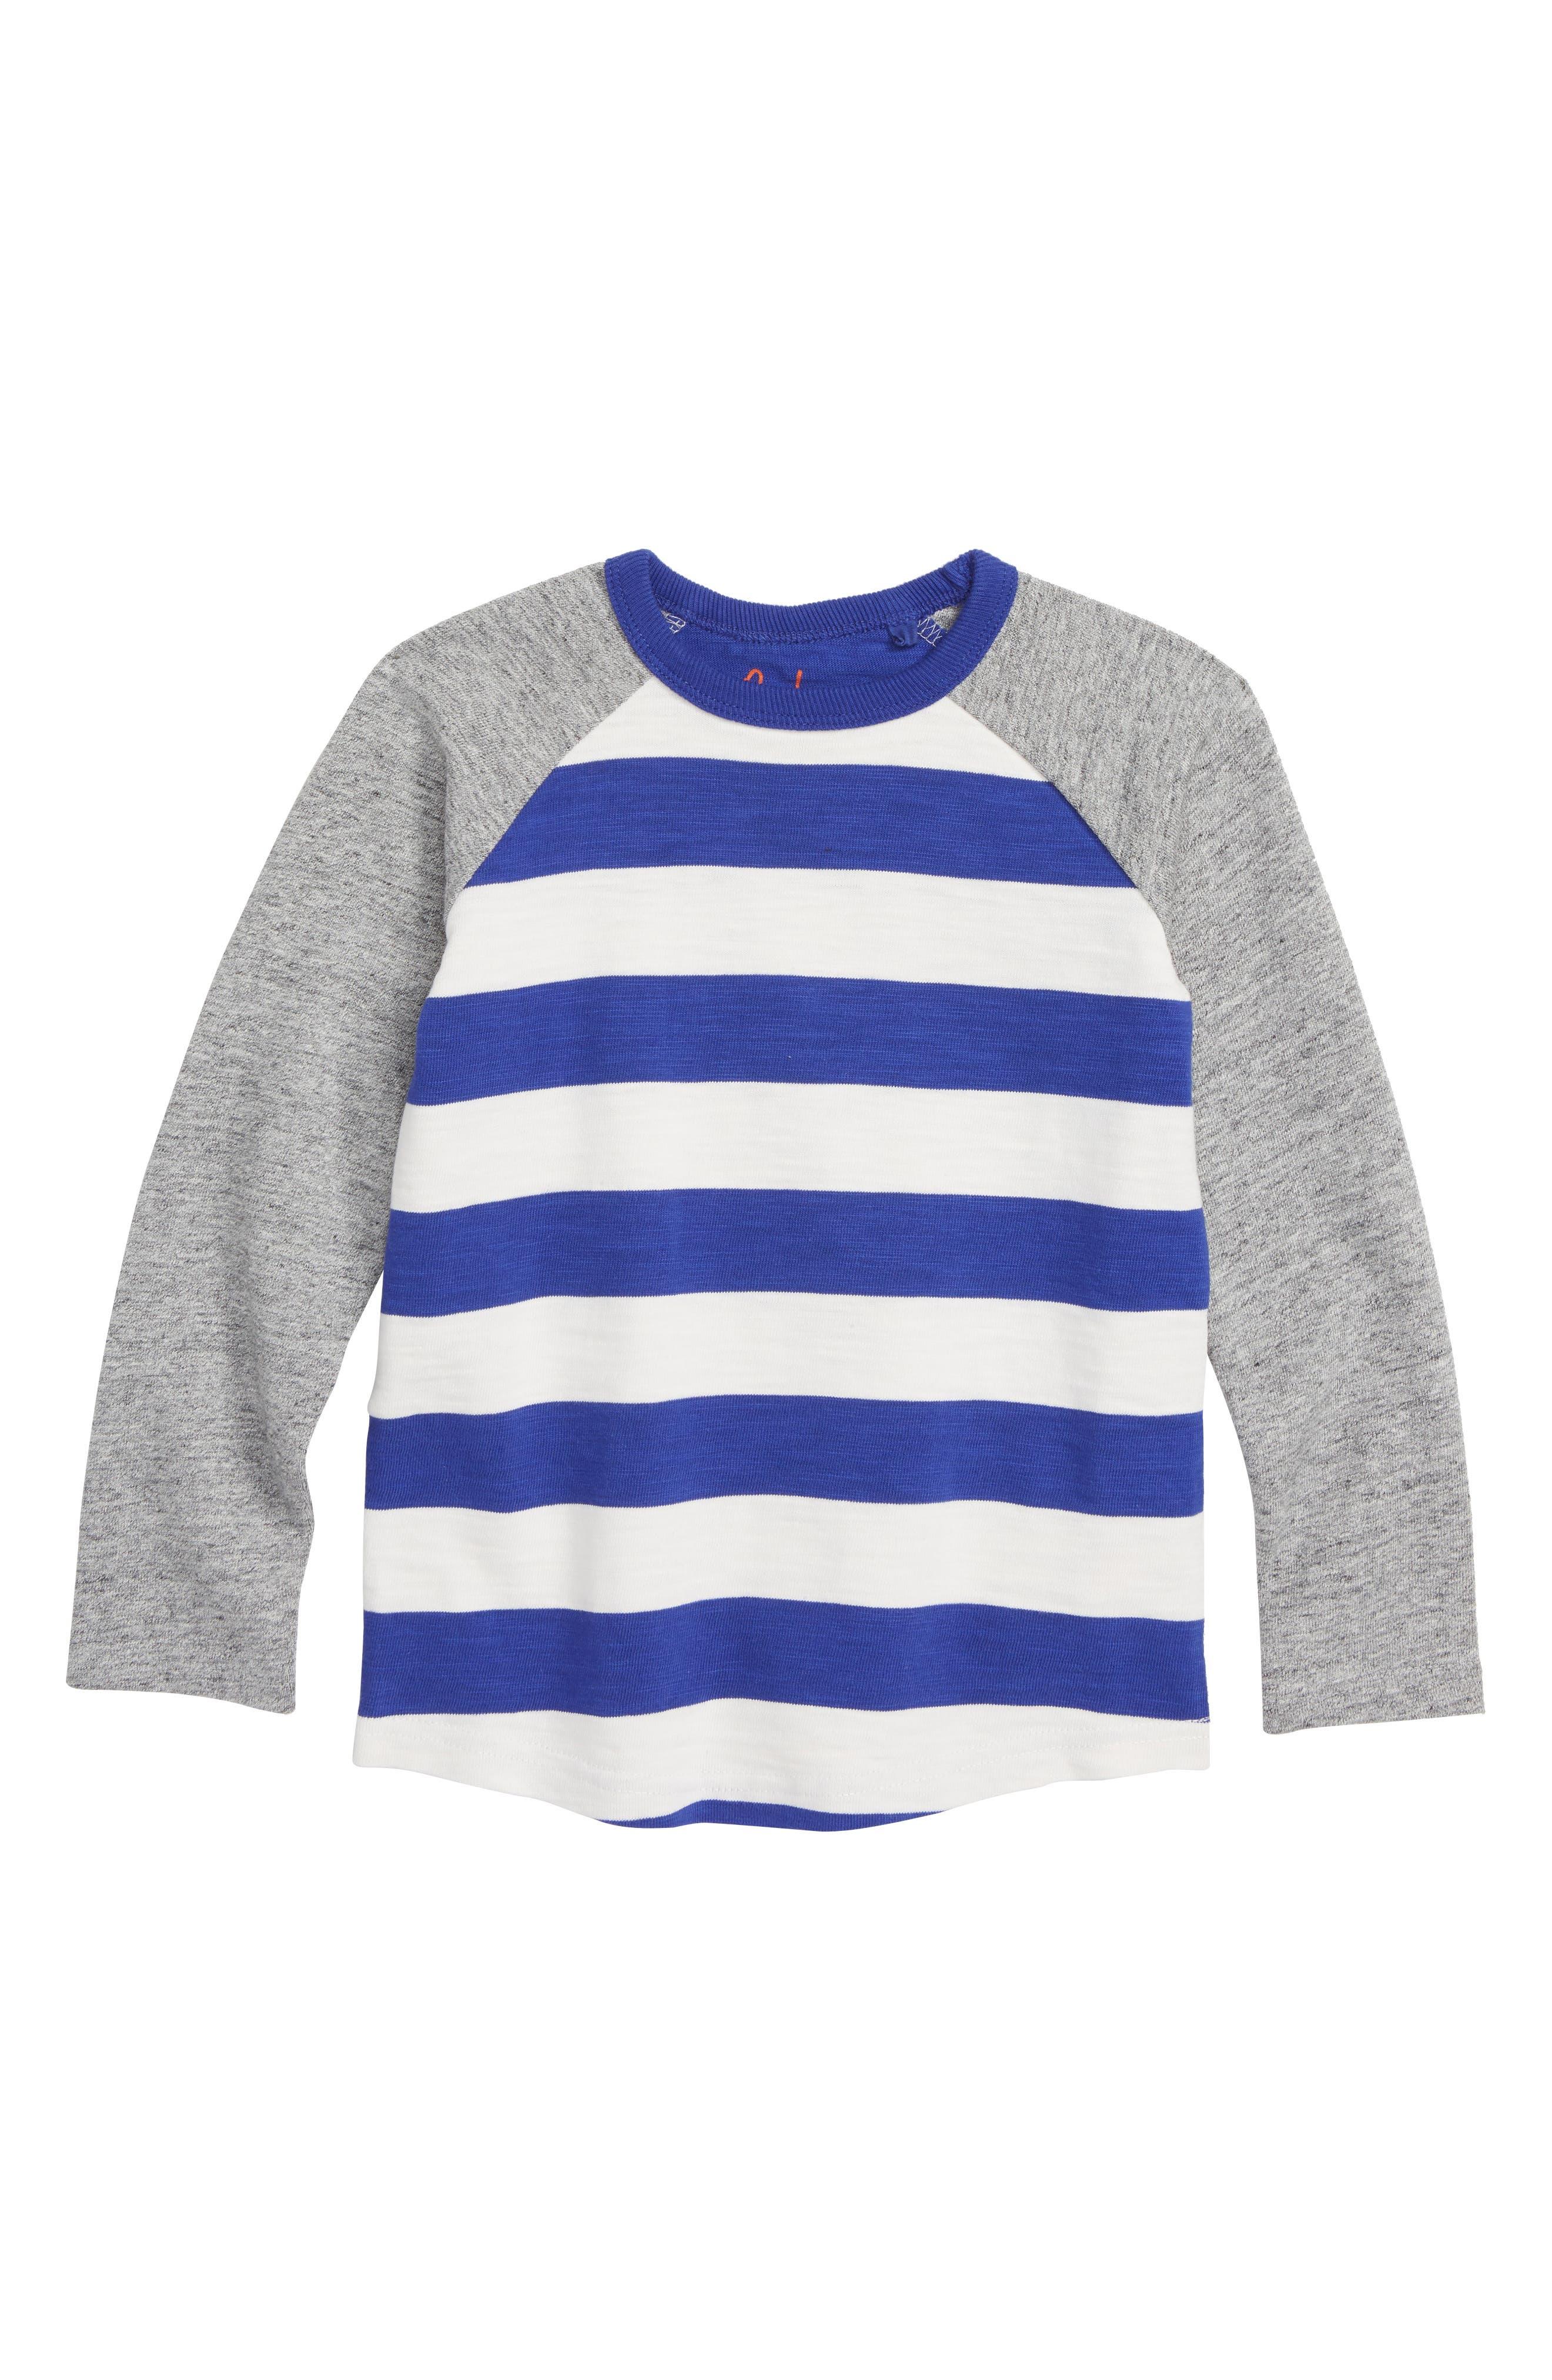 Stripe Raglan T-Shirt,                             Main thumbnail 1, color,                             RICHIE BLUE/ ECRU